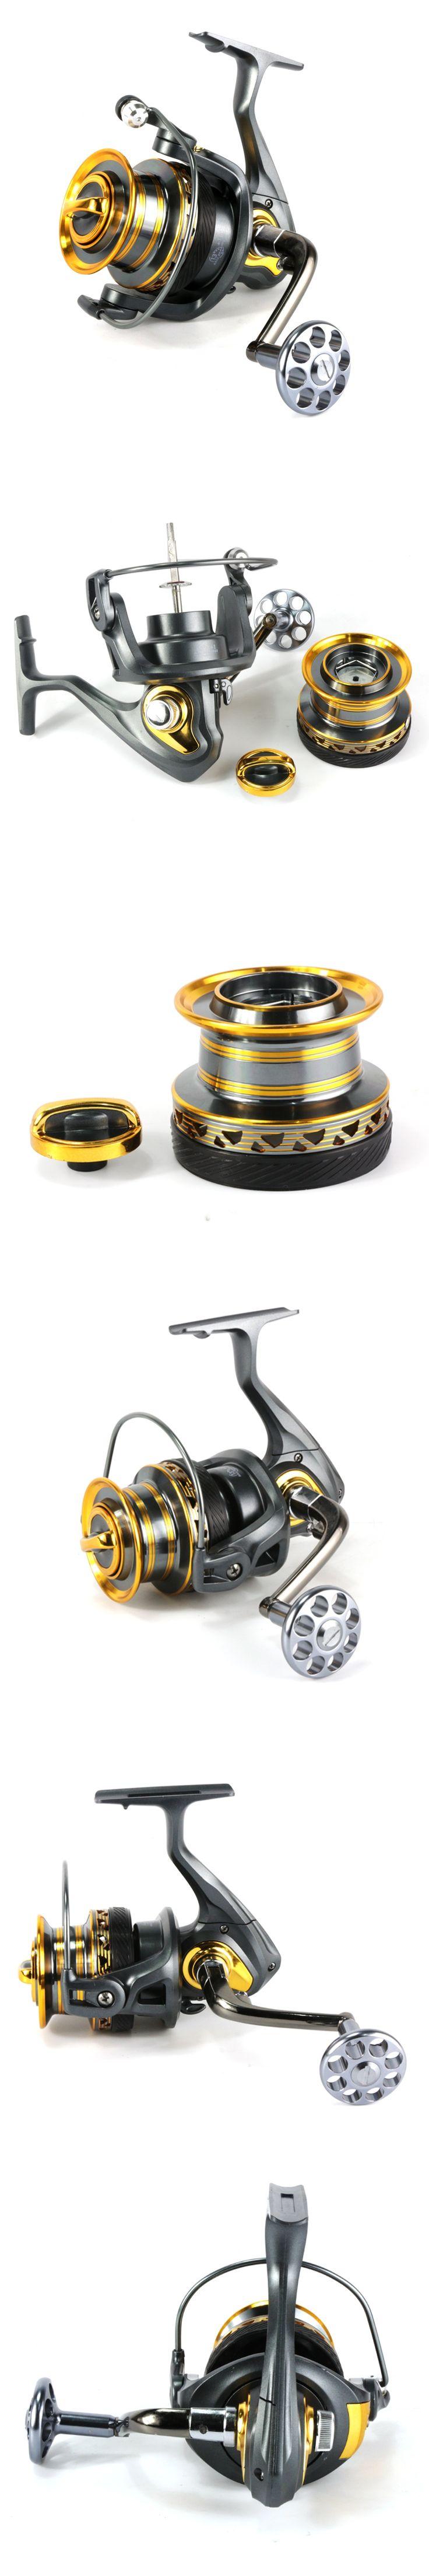 Metal distant wheel 4000-7000 series Metal Handle Spinning Fishing Reel 13+1BB Coarse Fishing Tackle Super Big Sea Fishing Wheel